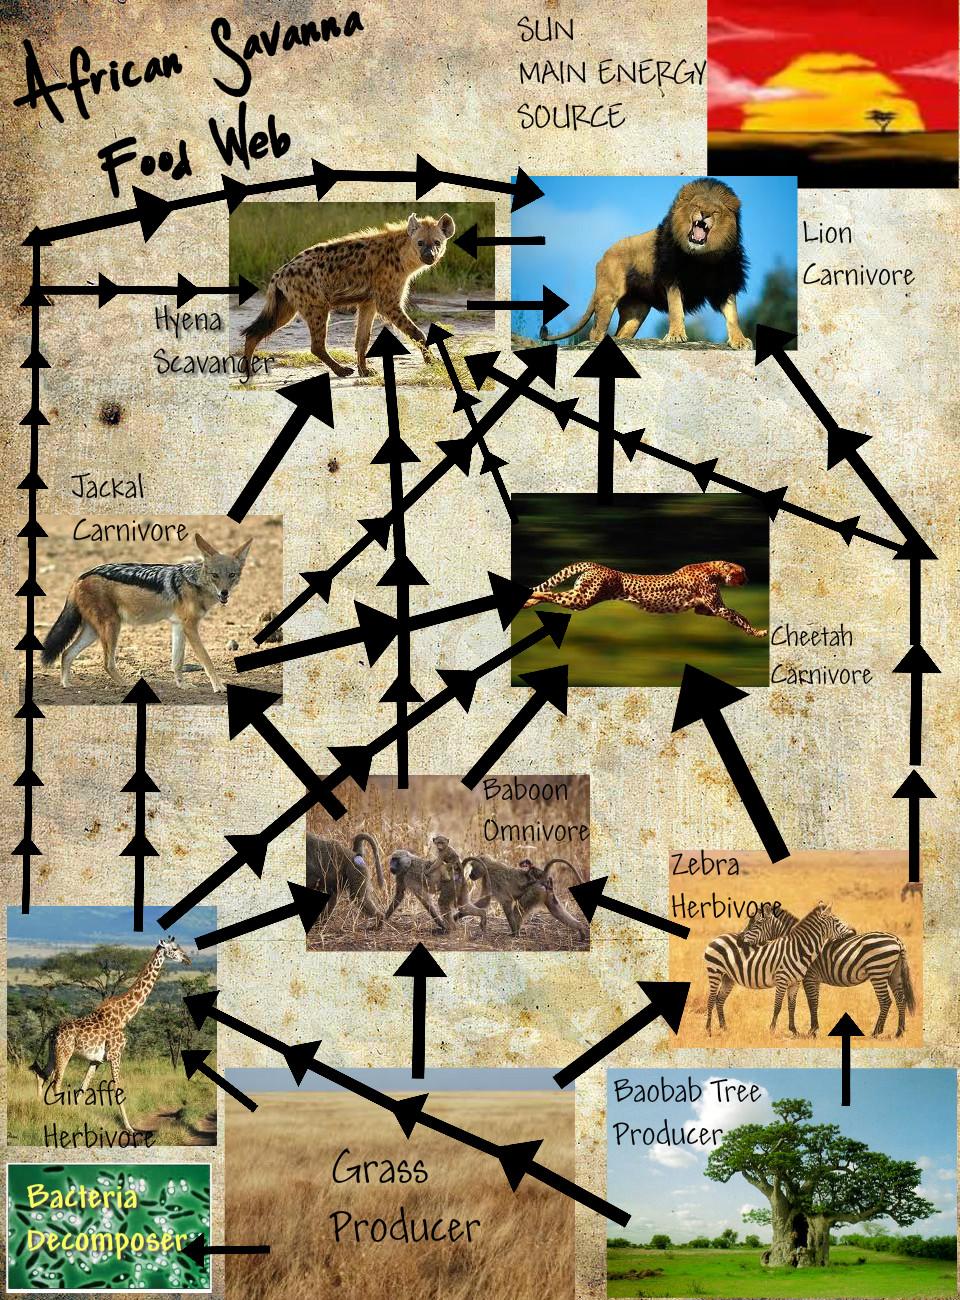 African Food Web